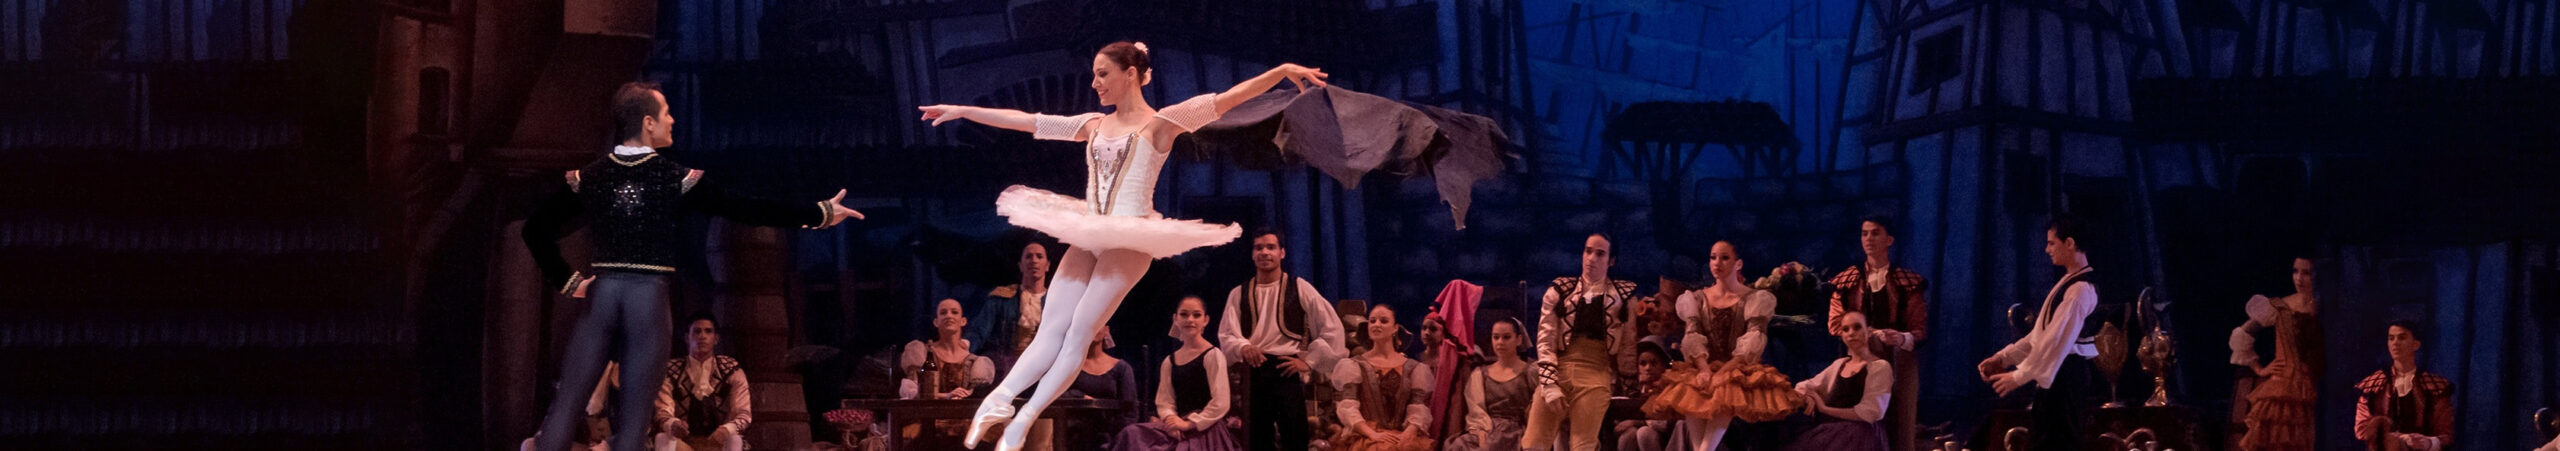 A live theatre ballet performance